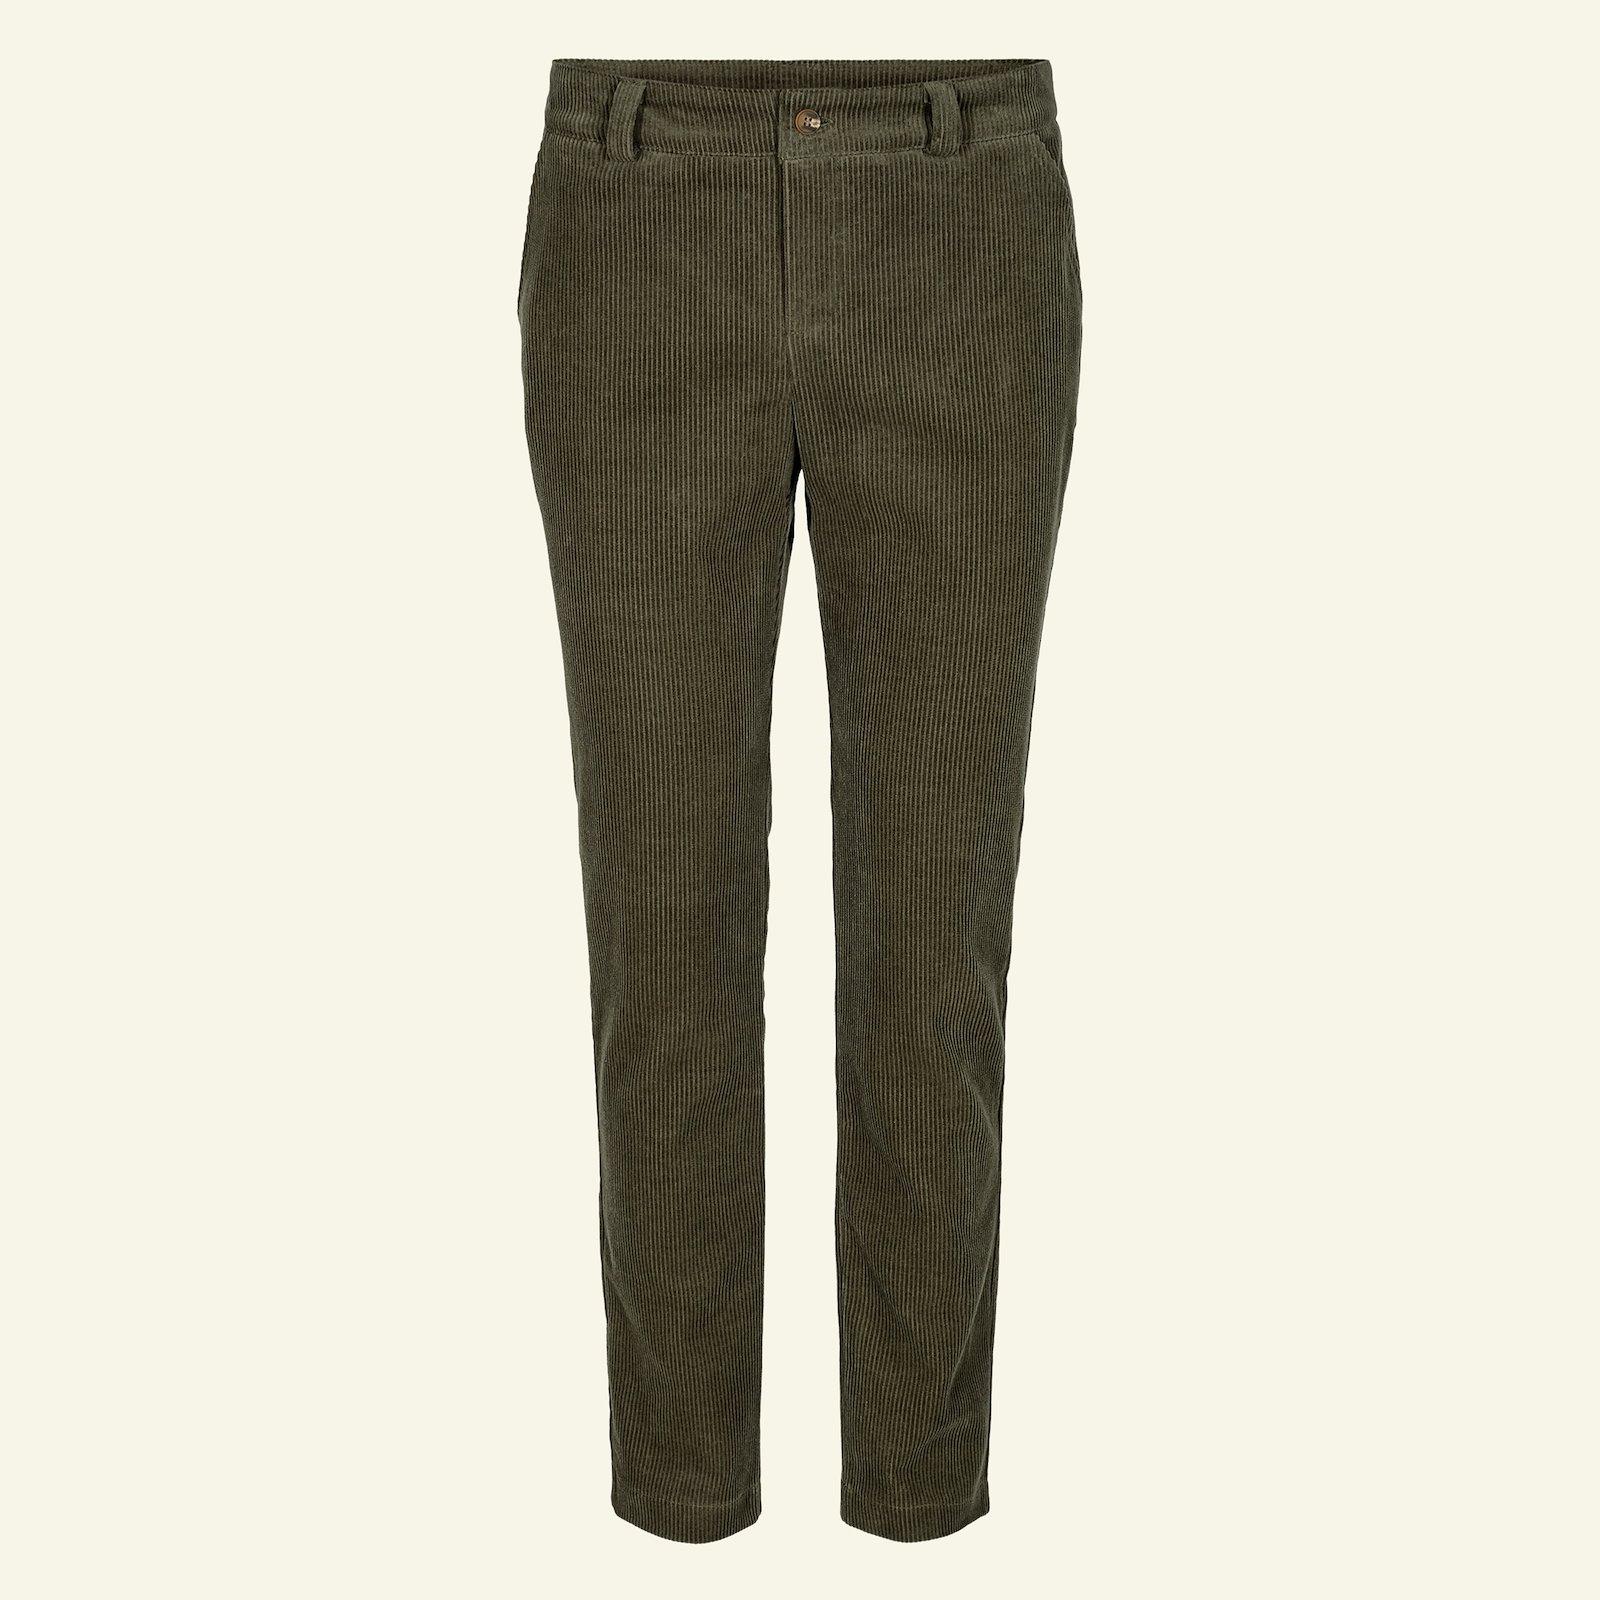 Trousers, 38/10 p20033_430000_sskit